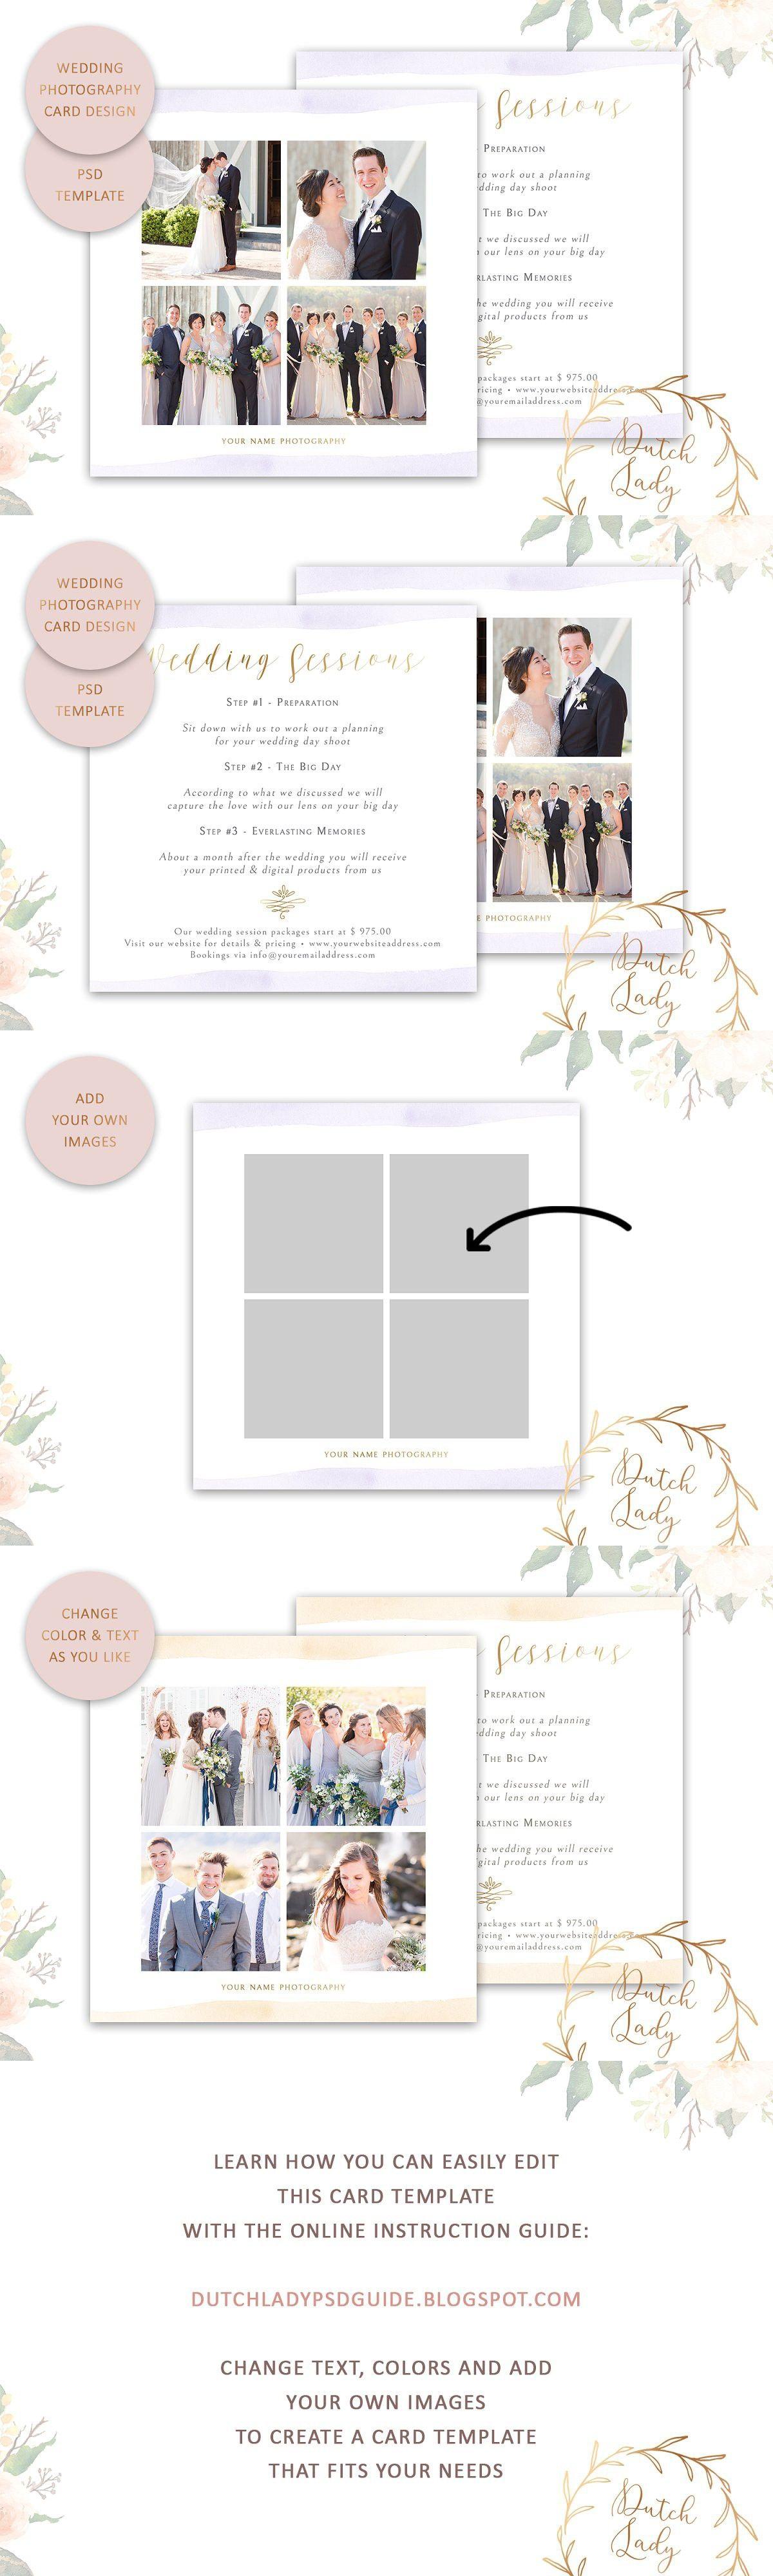 Psd Wedding Photo Card Template 4 Photo Wedding Card Photo Card Template Card Template